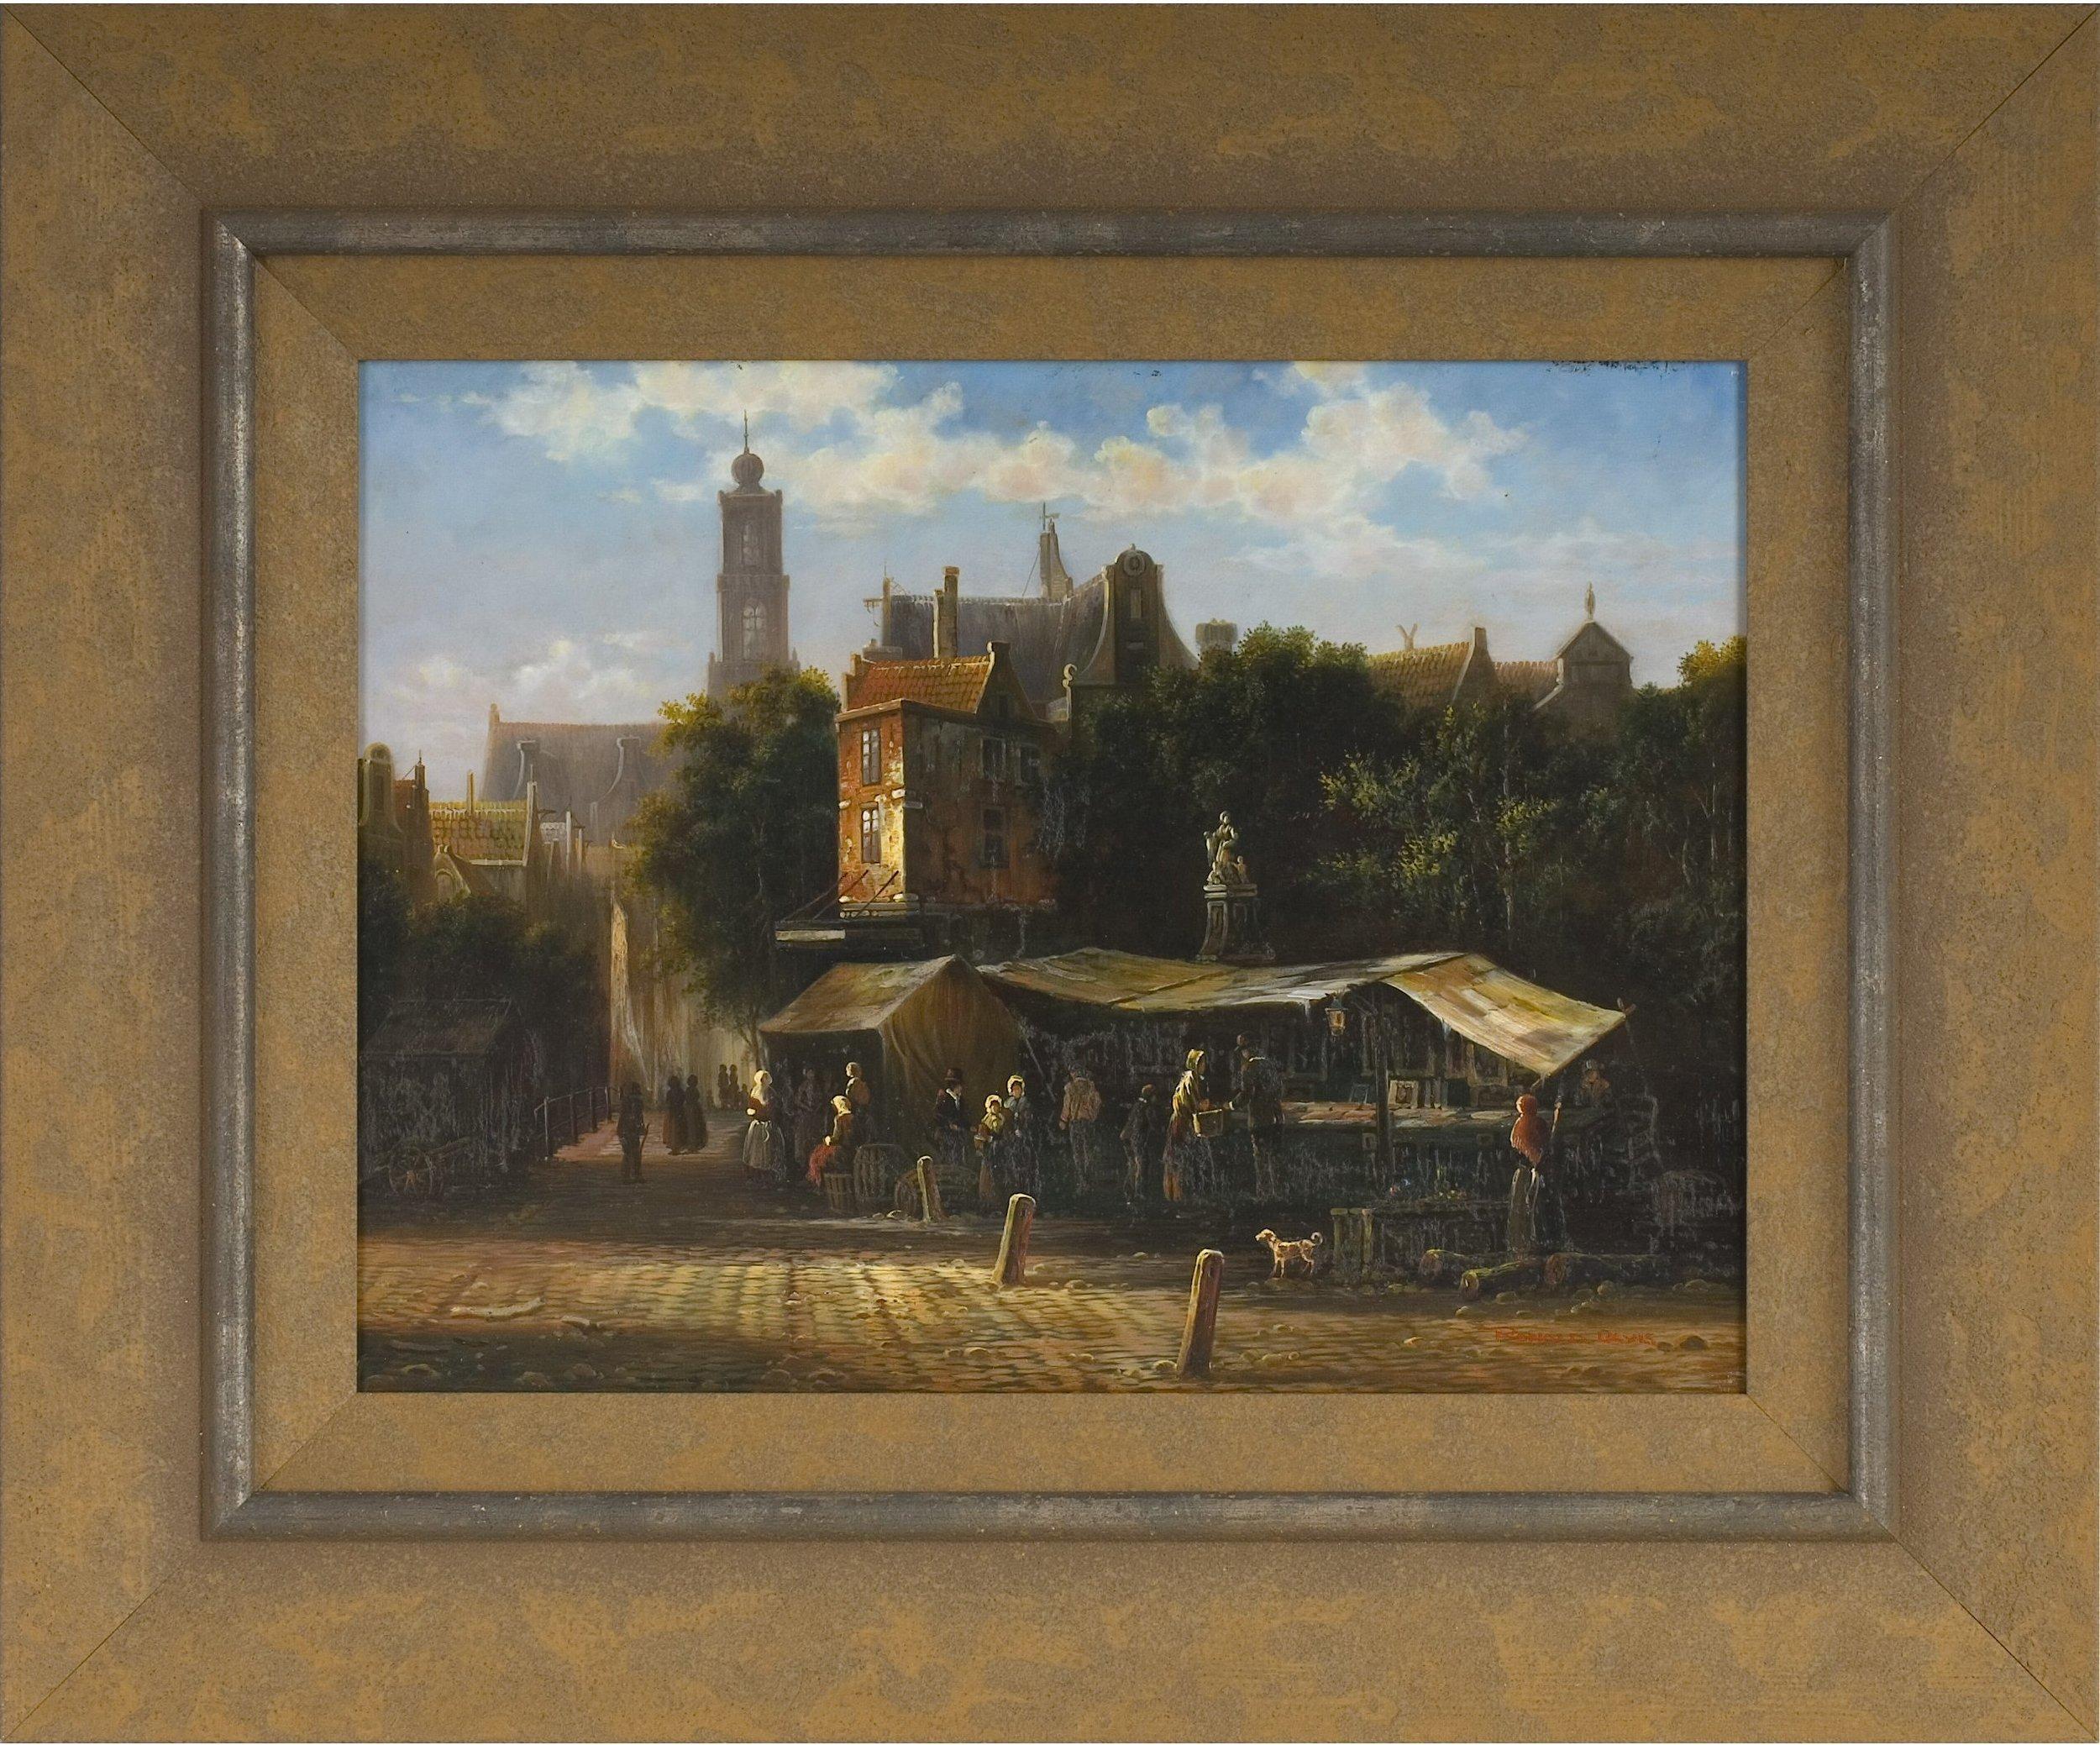 Acropolis+European+Market+Old+World+Painting.jpg